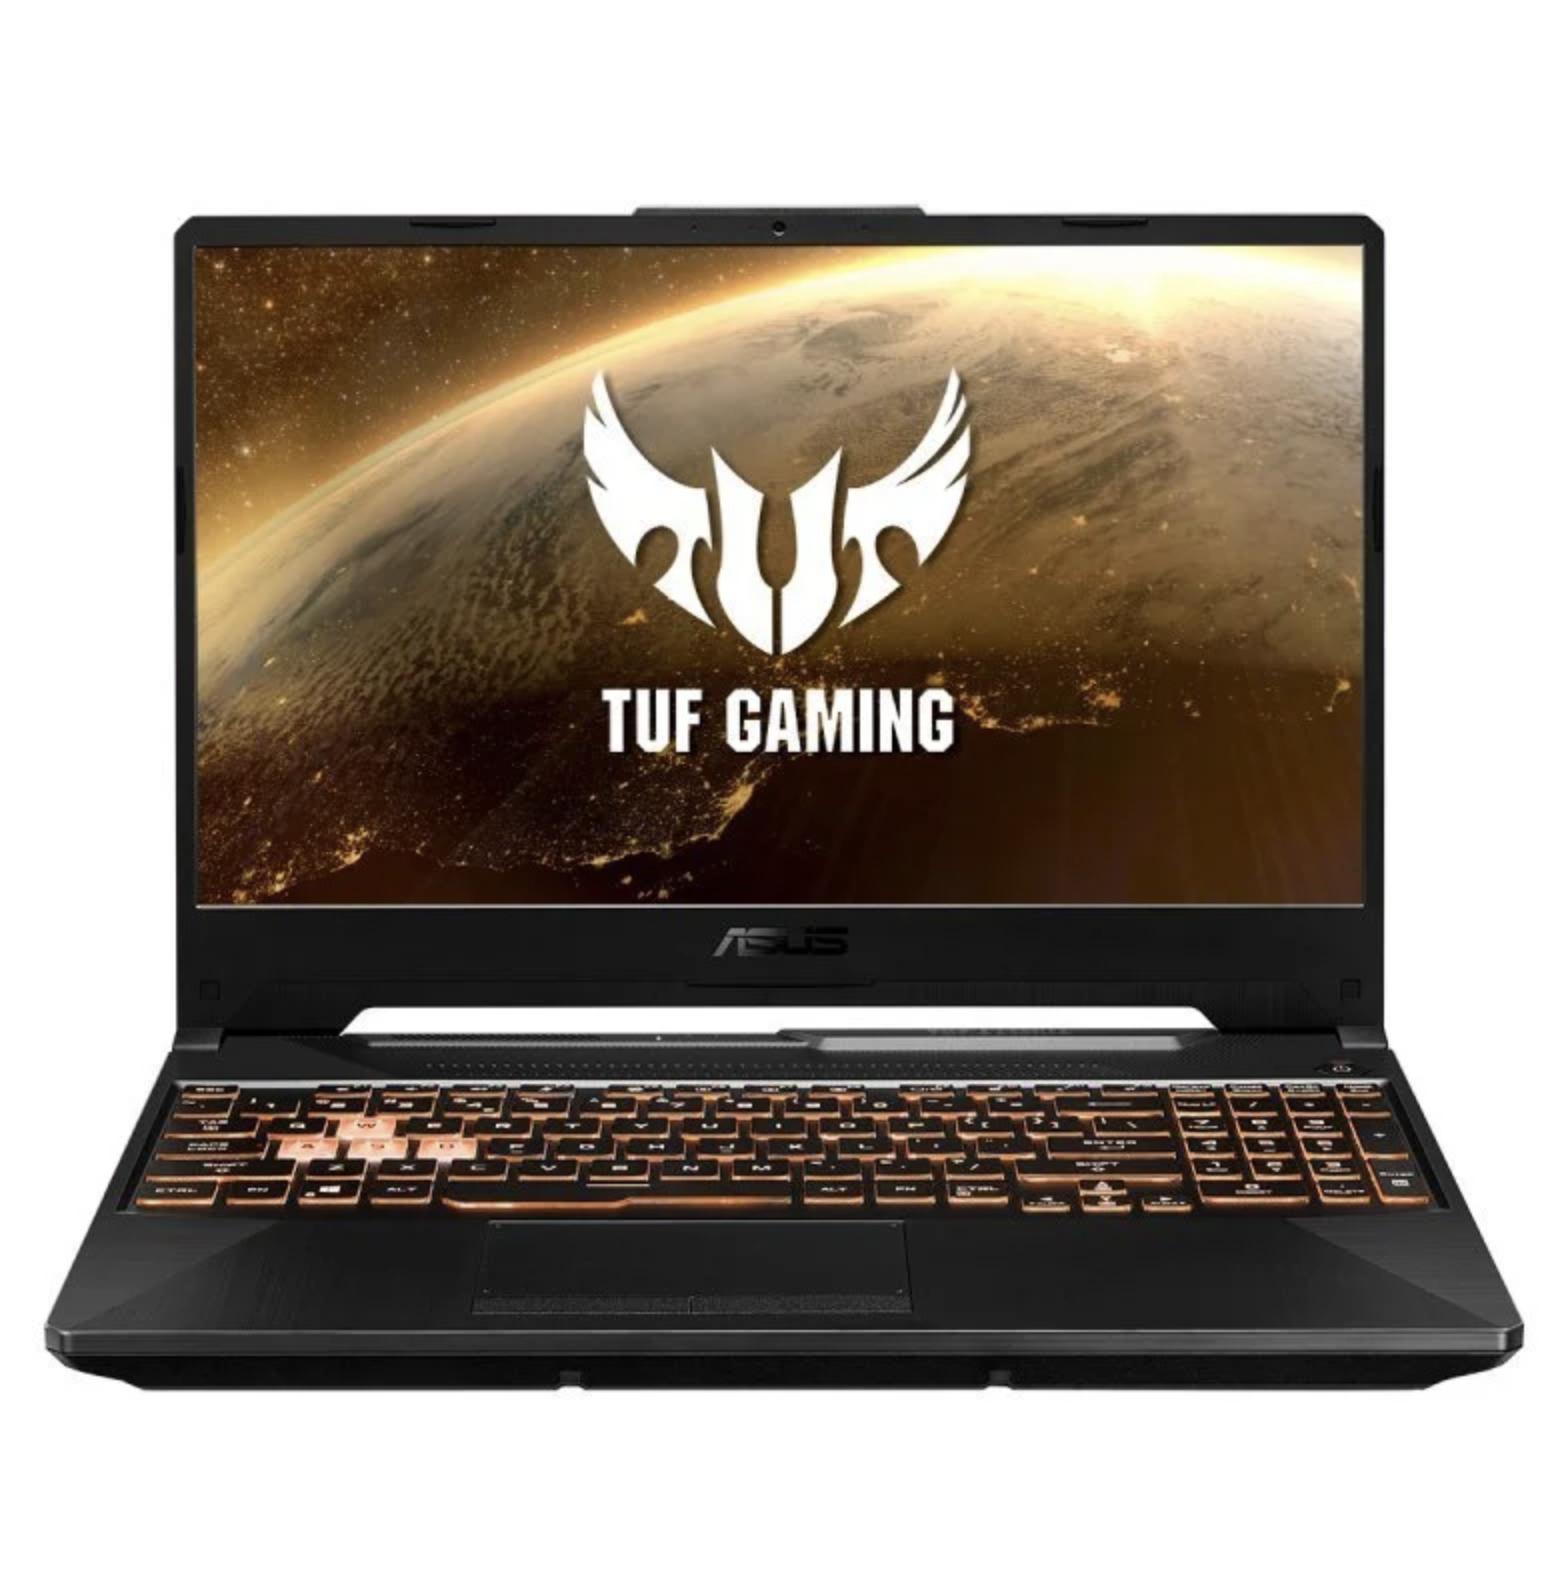 ASUS TUF Gaming F15 FX506LH HN129 Intel Core I7 10870H 16GB 512GB SSD GTX1650 156